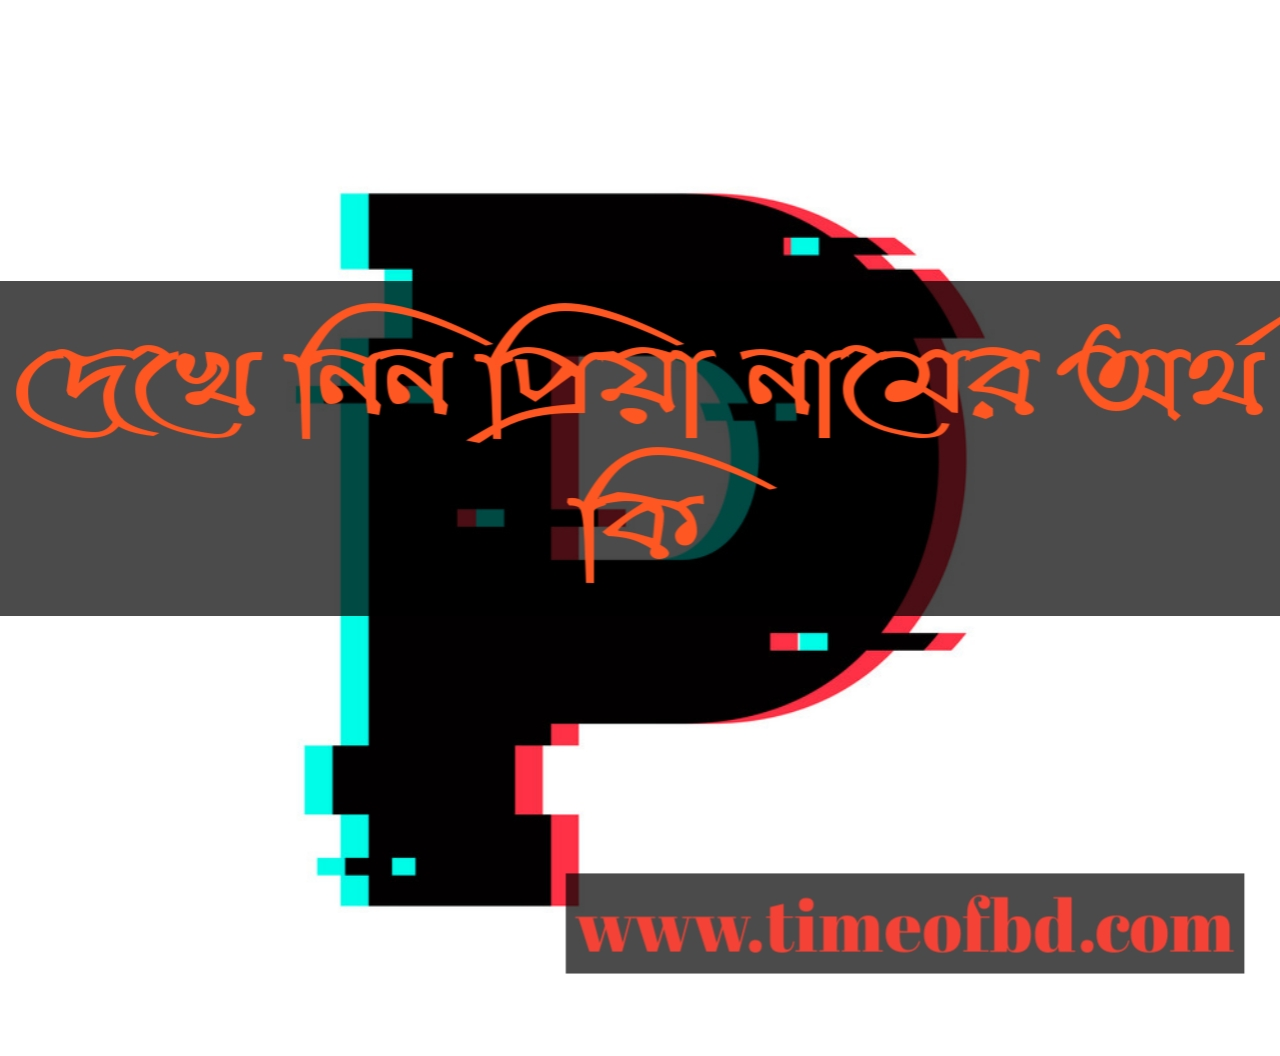 priya name meaning in Bengali, প্রিয়া নামের অর্থ কি, প্রিয়া নামের বাংলা অর্থ কি, প্রিয়া নামের ইসলামিক অর্থ কি,